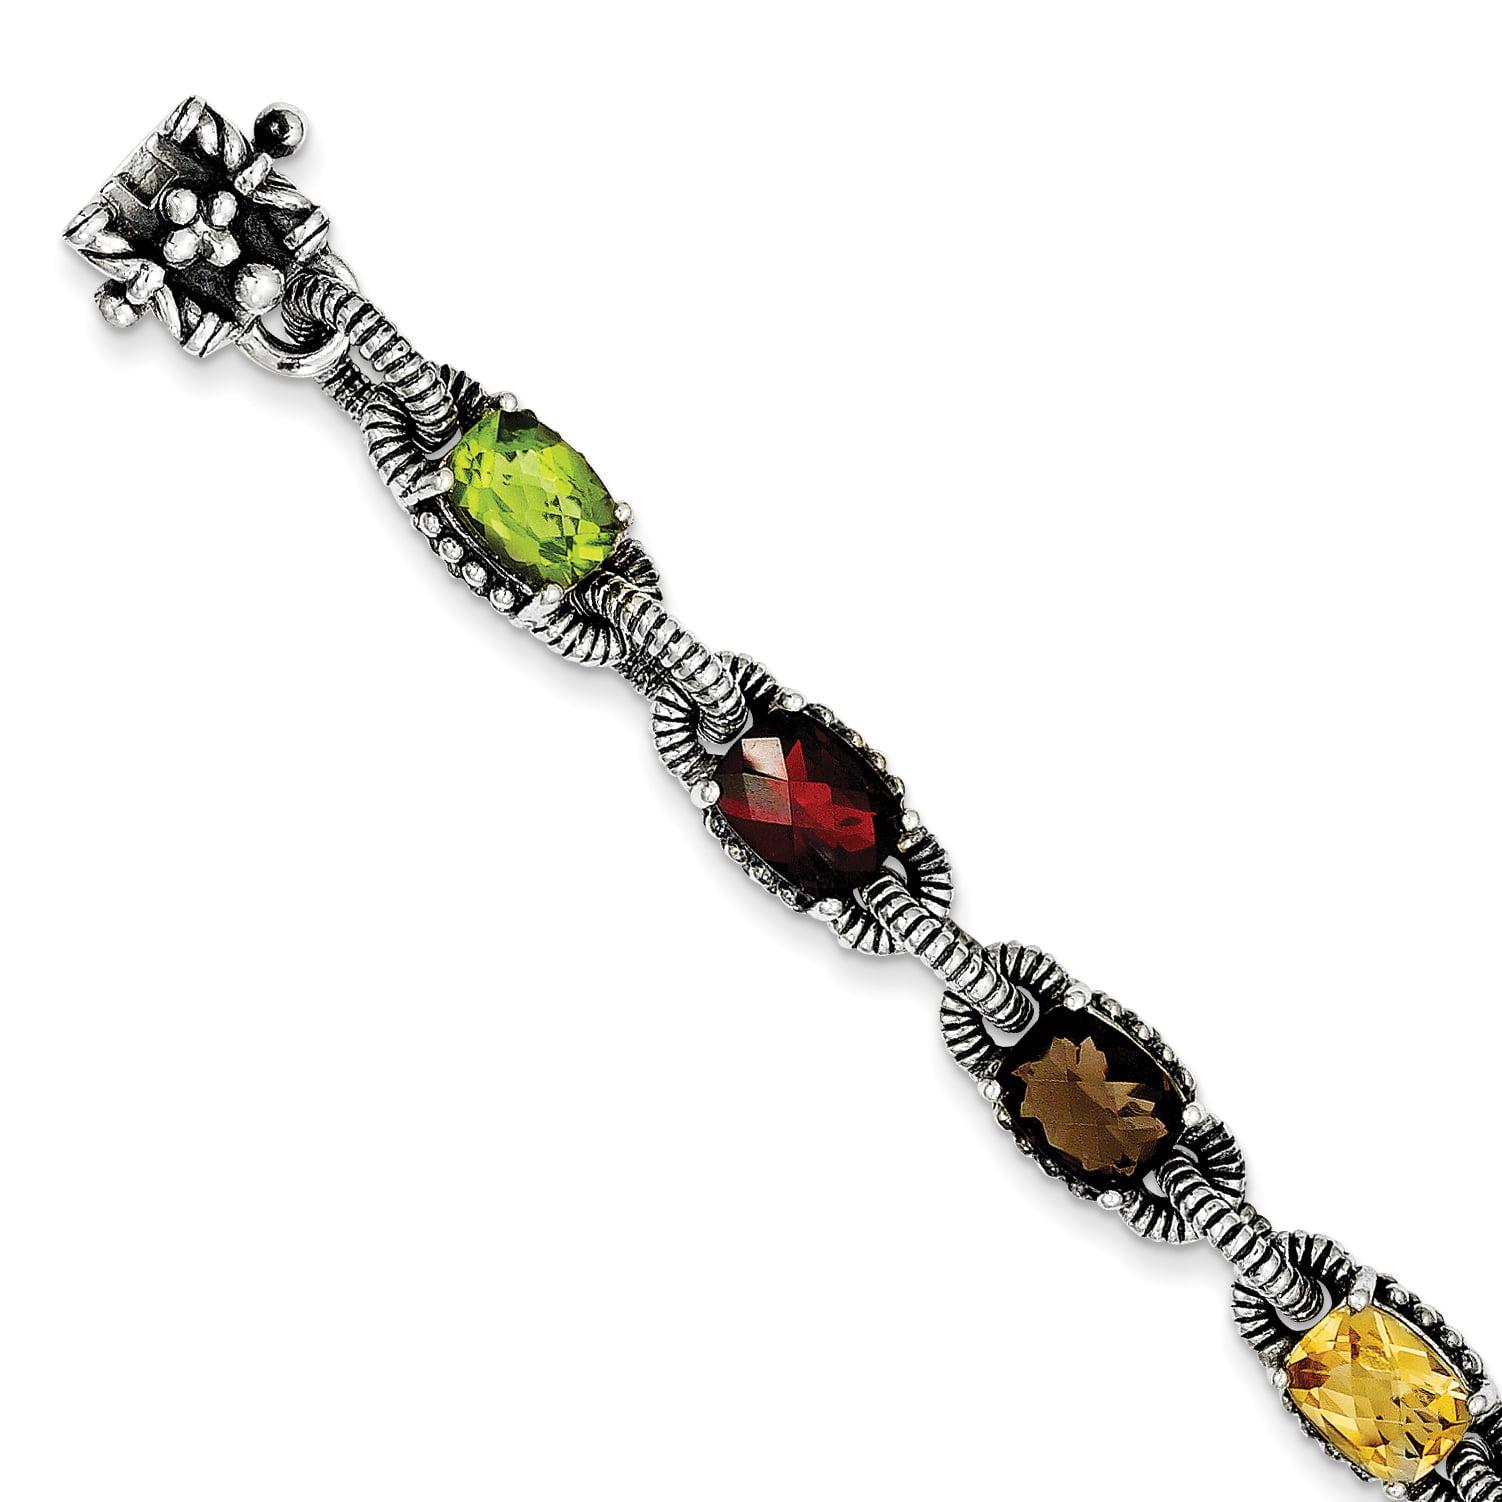 925 Sterling Silver Amethyst Citrine Garnet Peridot Smoky Quartz Bracelet by